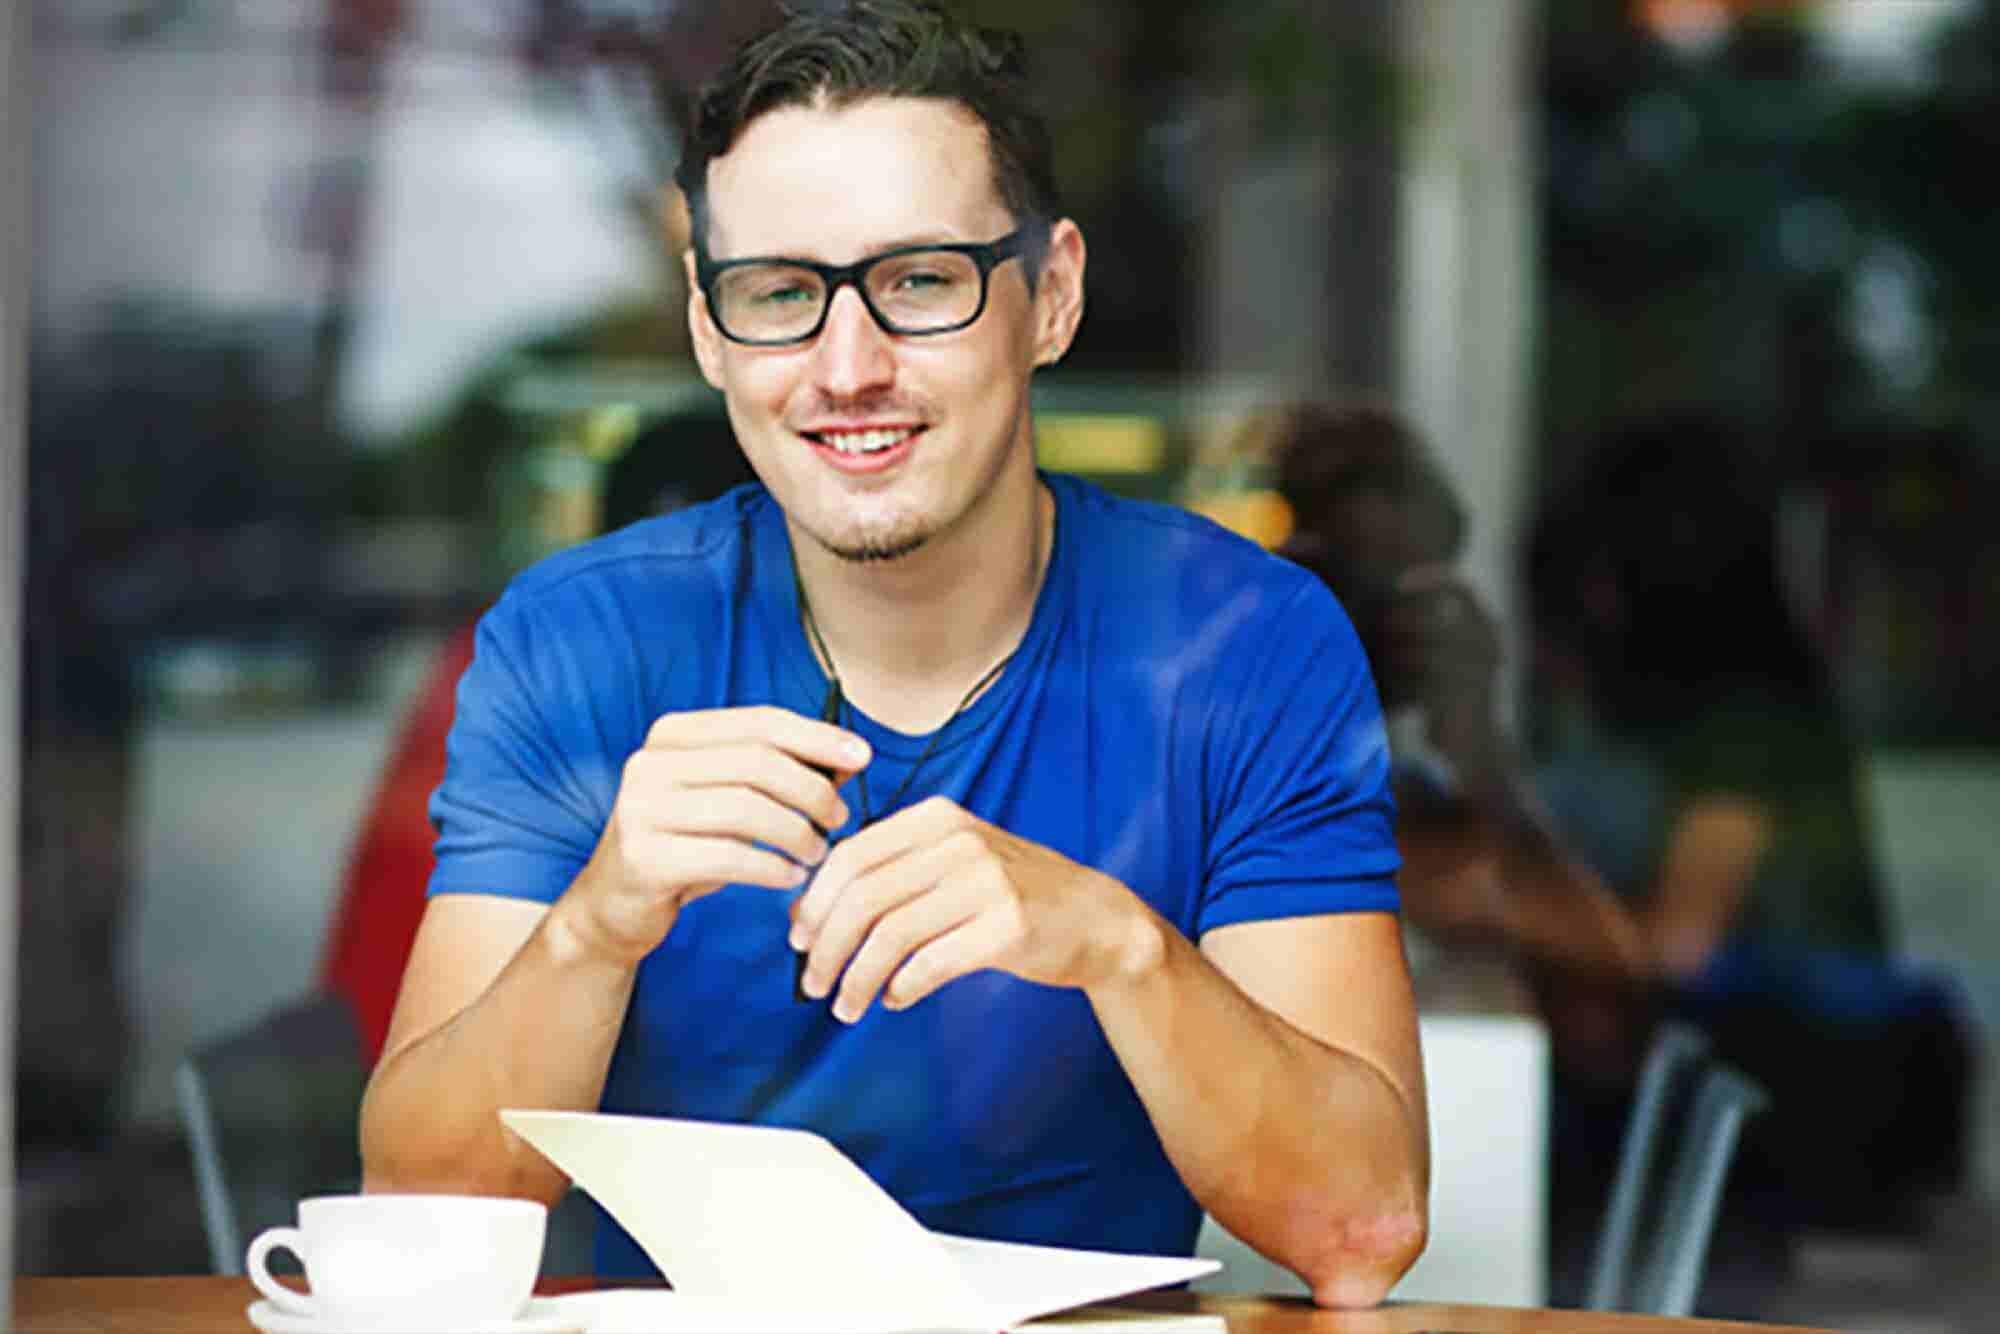 5 cosas que debes saber antes de emprender